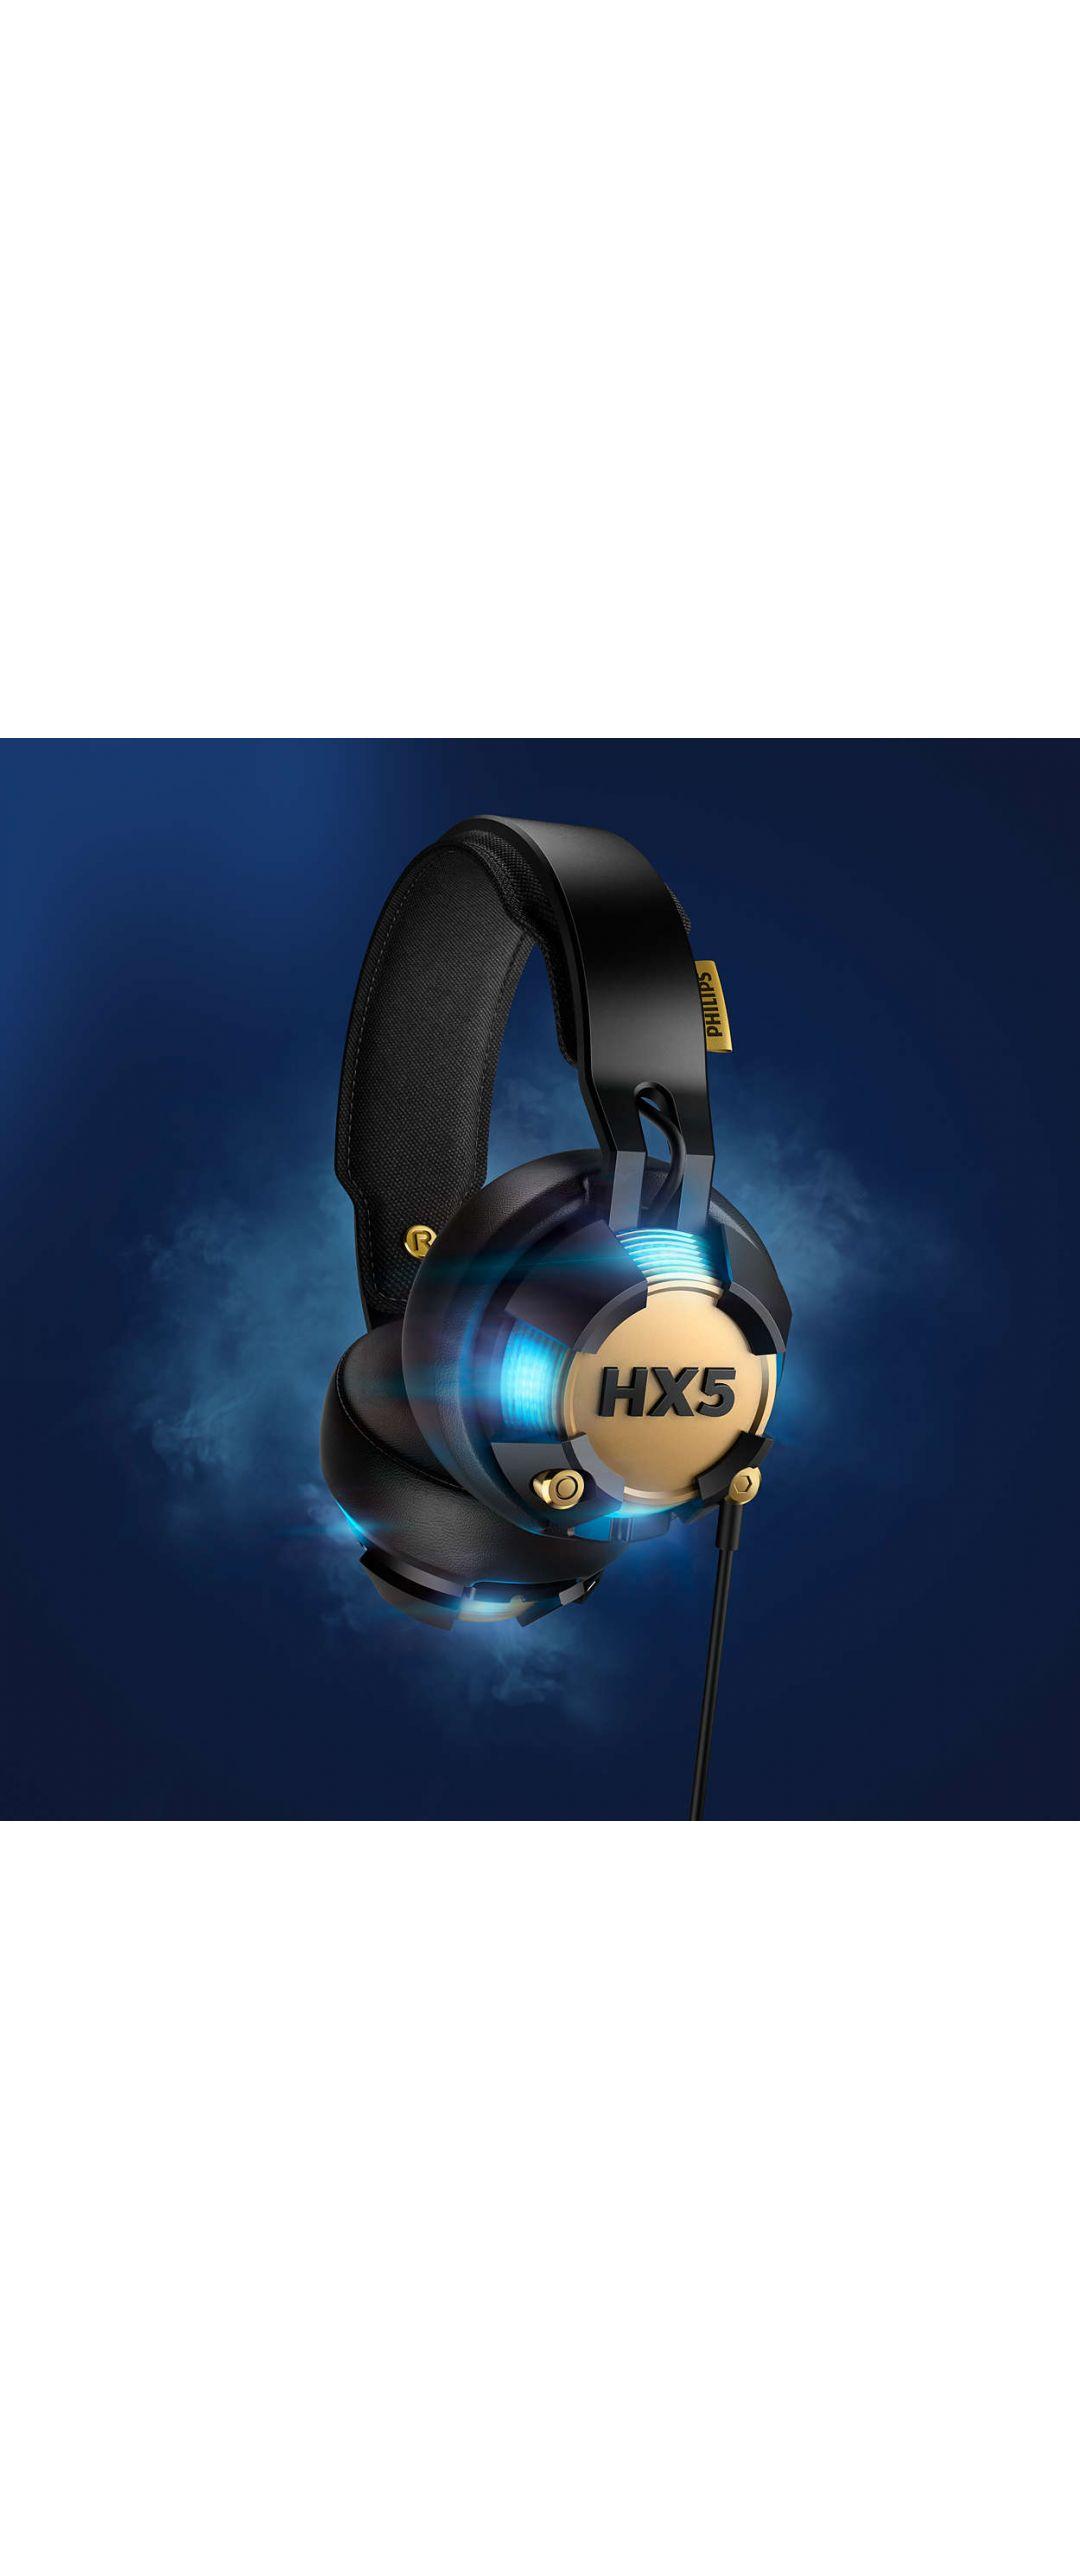 Review: Audífonos Philips HX5 [FW Labs]